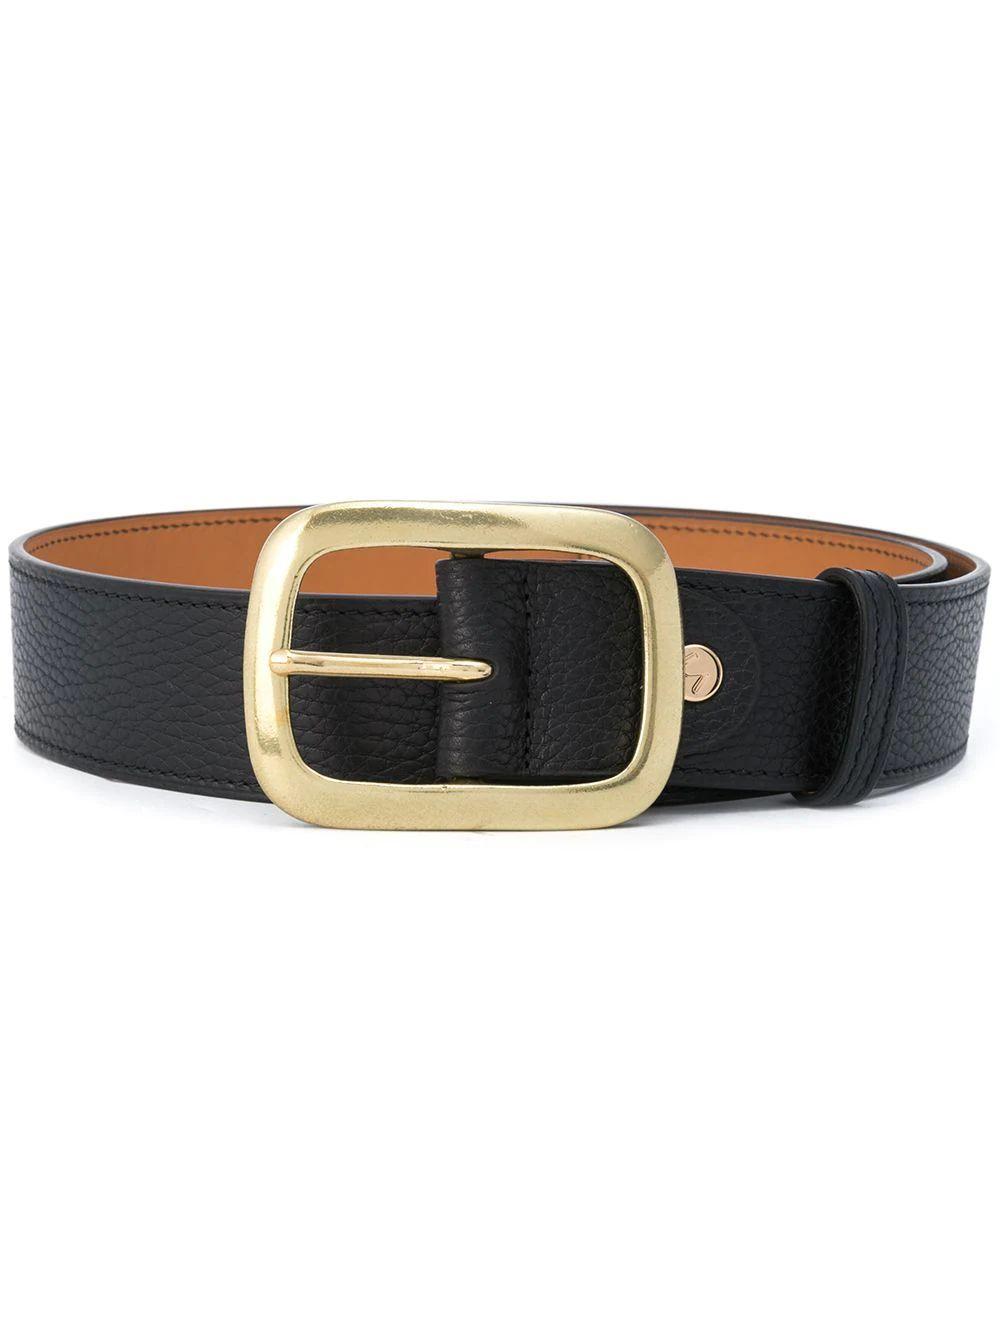 La Captivante Buckle Belt